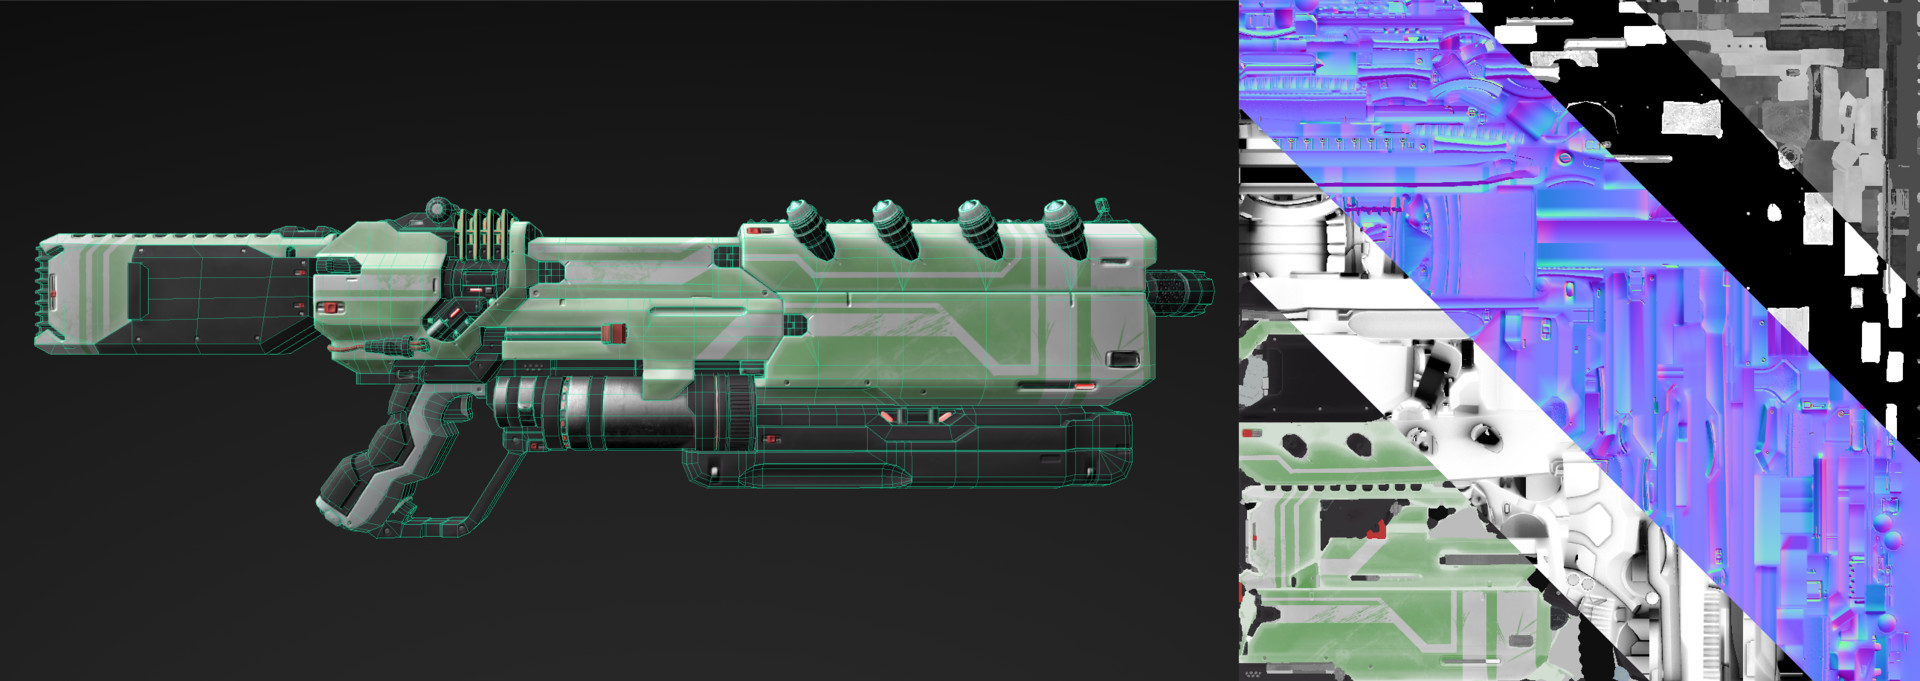 Aivis ozols energyweapon06